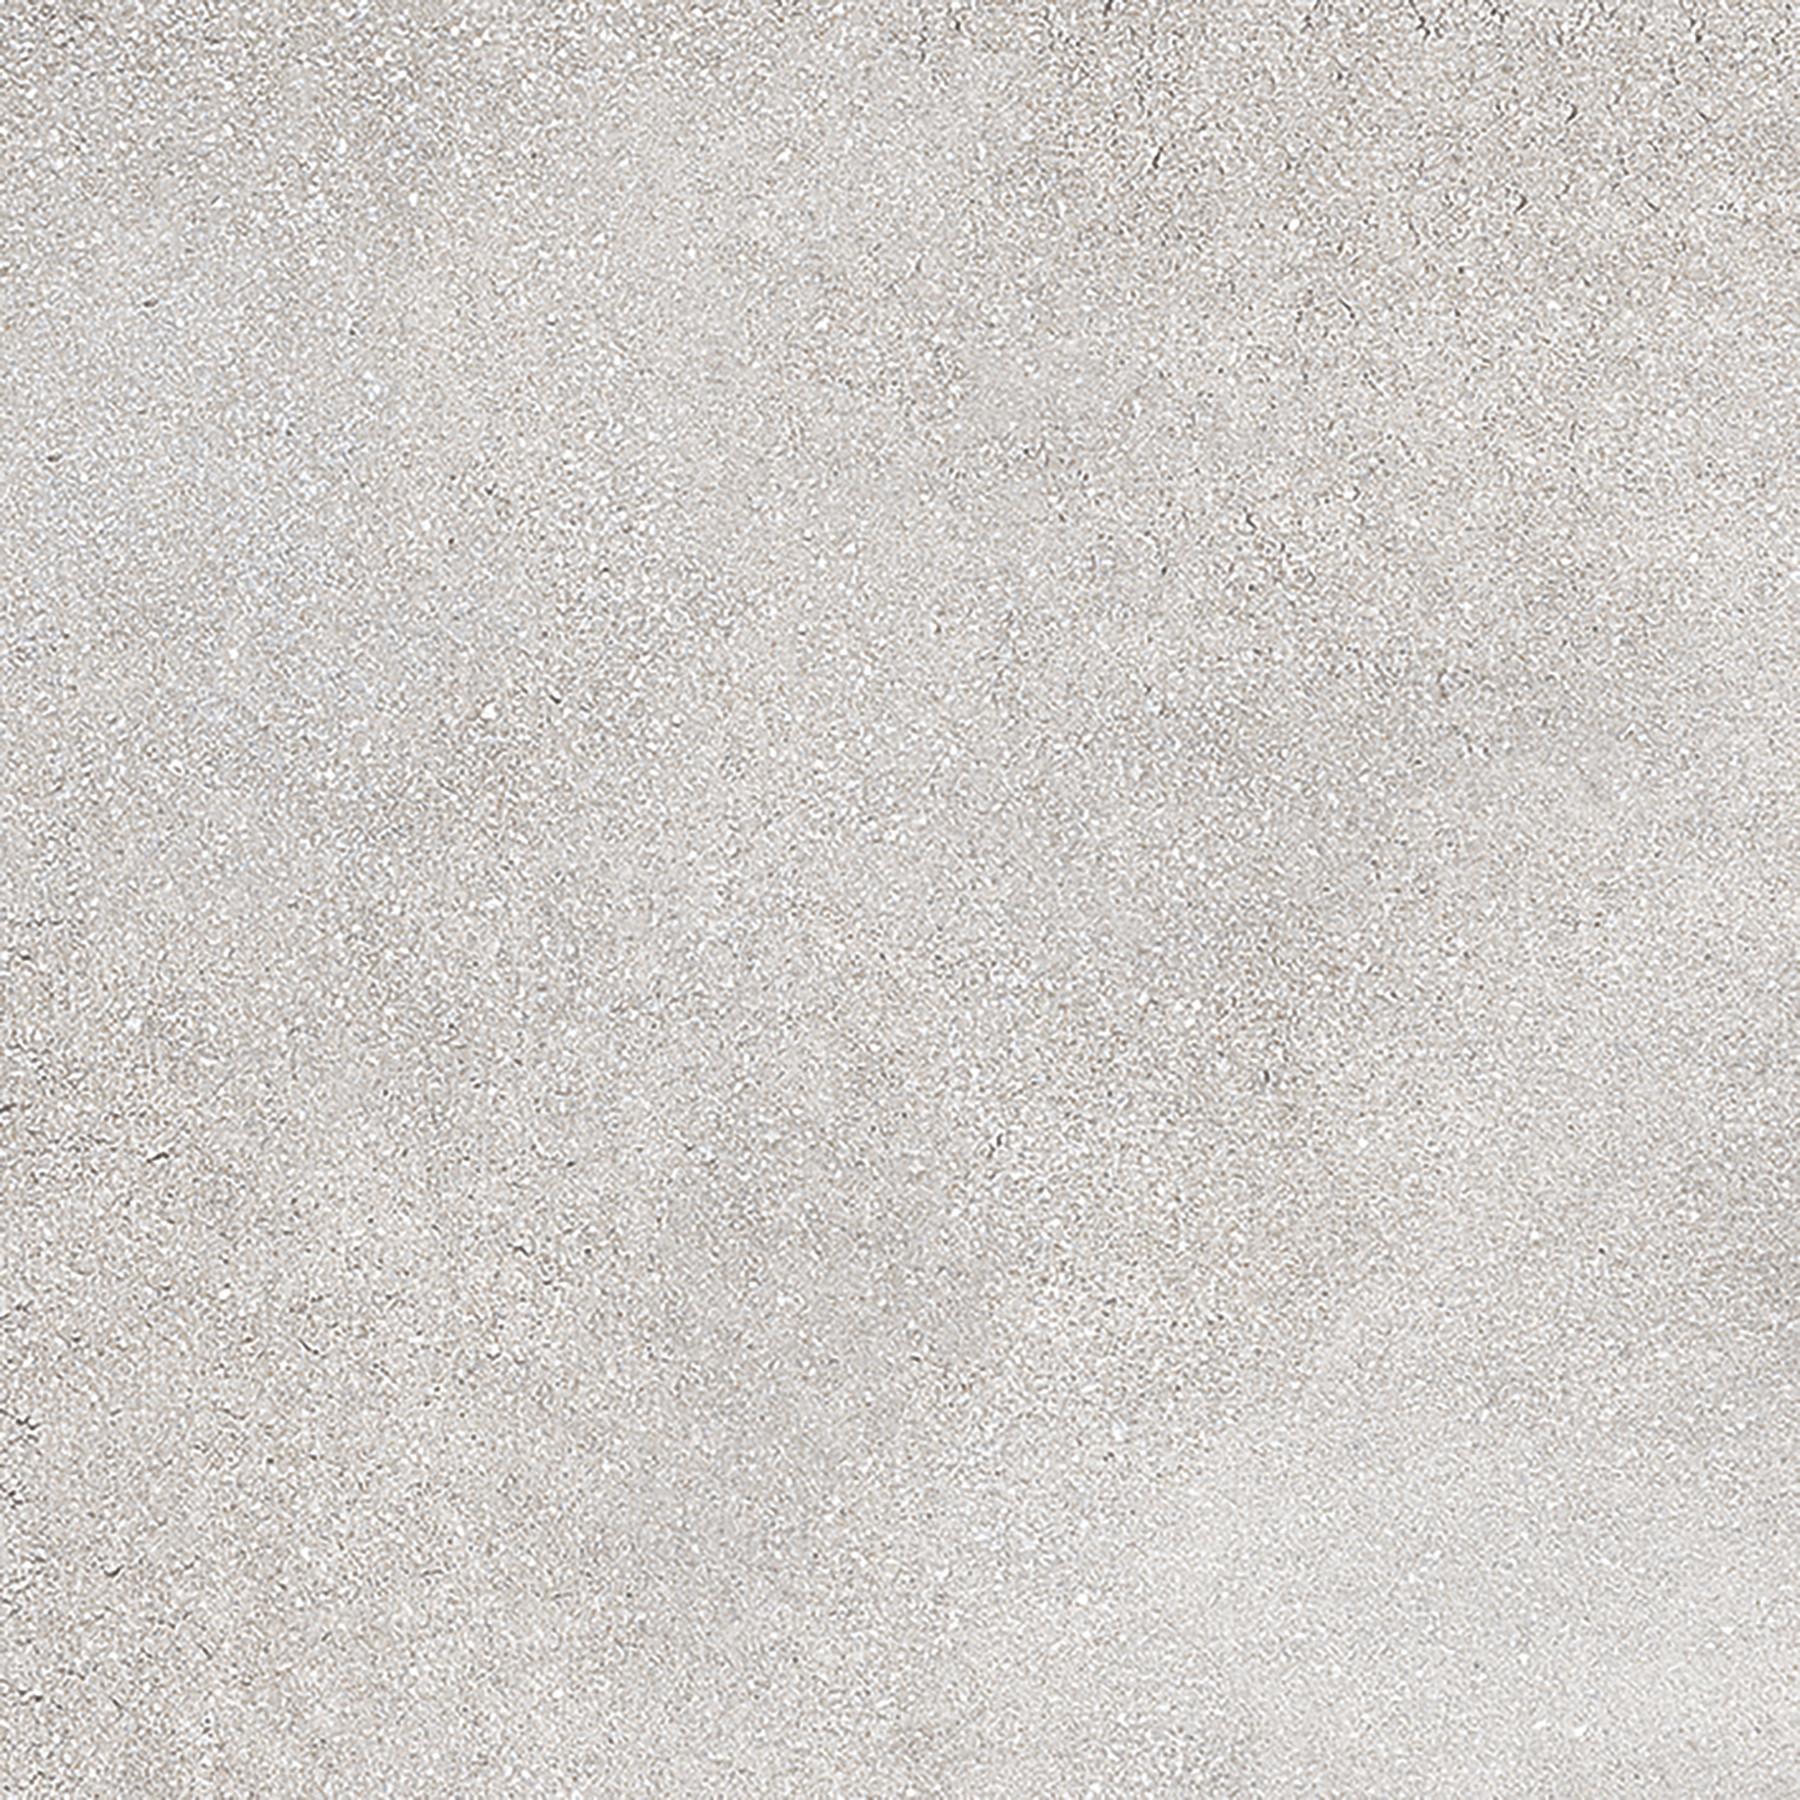 EMPOLI 20x20 Gray Fon 02.jpg